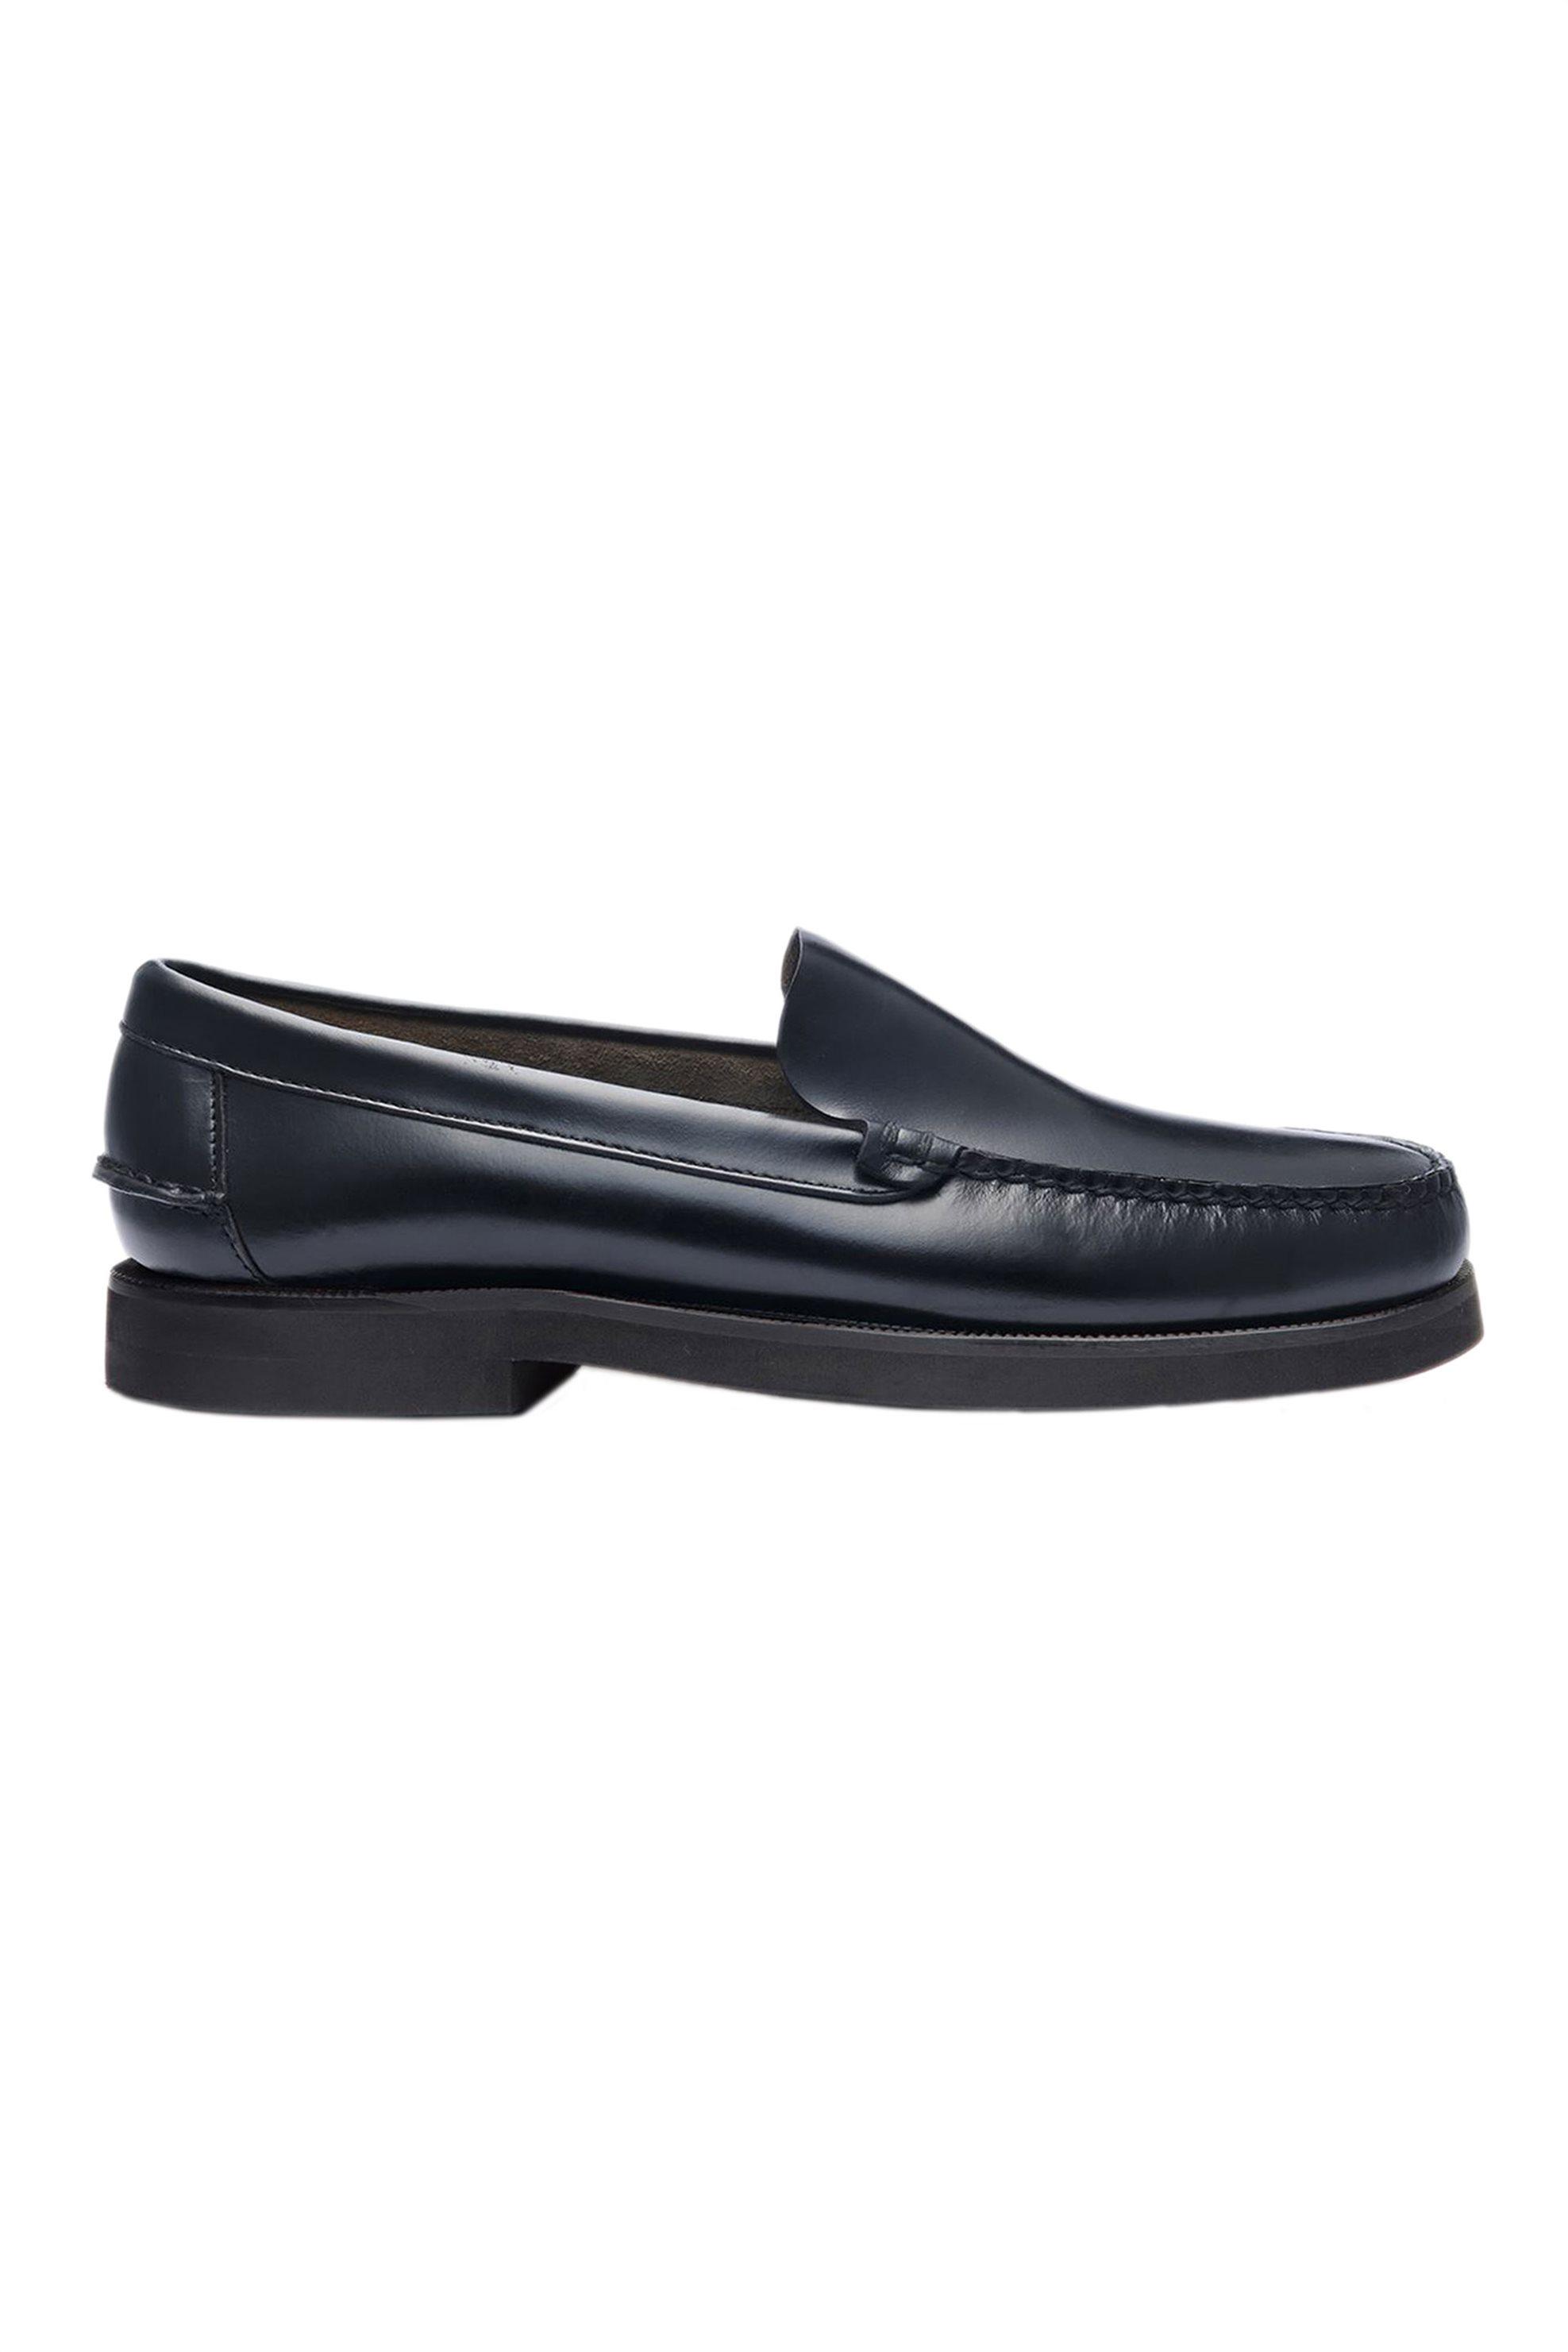 "Sebago® ανδρικά penny loafers δερμάτινα ""Frank Polaris"" – L7001G70-902R – Μαύρο"